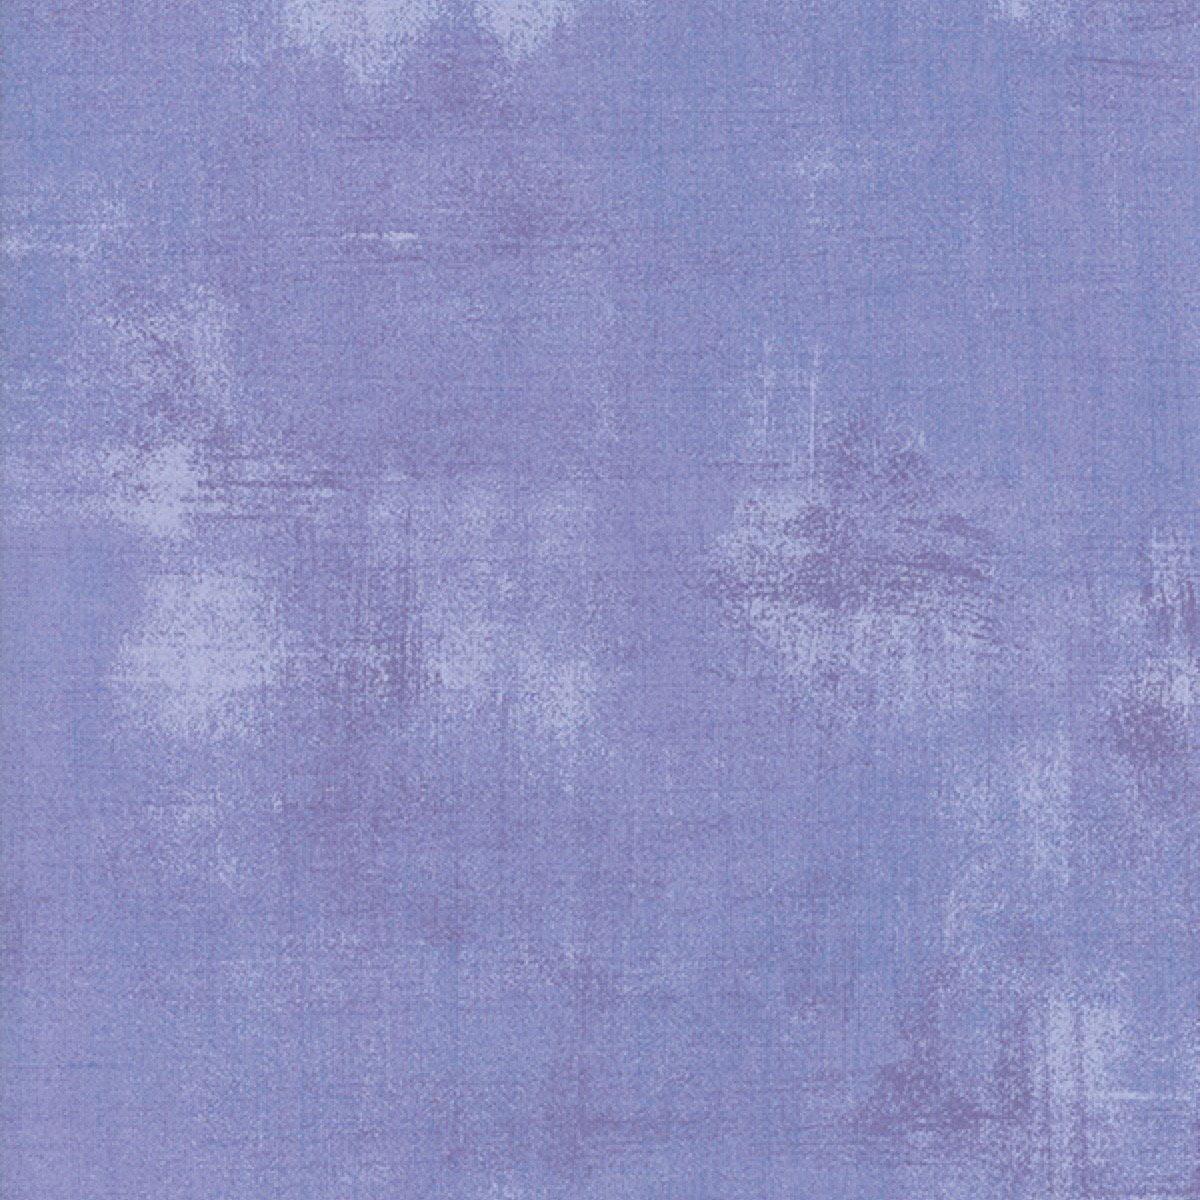 Moda Fabrics Grunge Texture New Colors 2017~Sweet Lavender Cotton Fabric